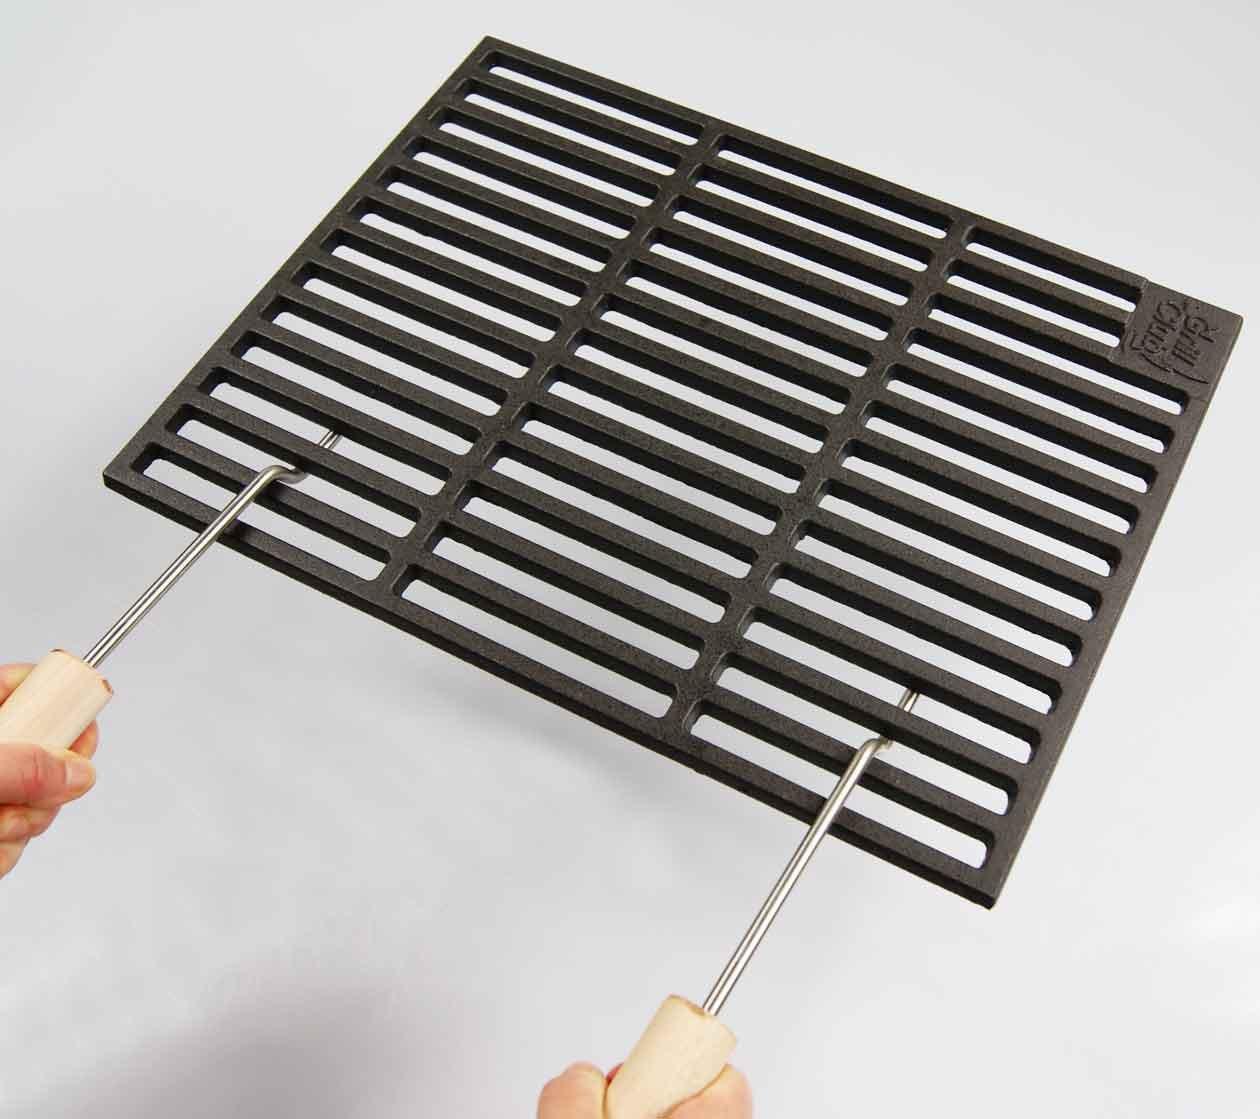 Gusseisen Grillrost 53 x 38 cm Grillclub + 2 abnehmbare Handgriffe für Wellfire Quatro Guss, Gasgrill, Rost, Grill Buschbeck